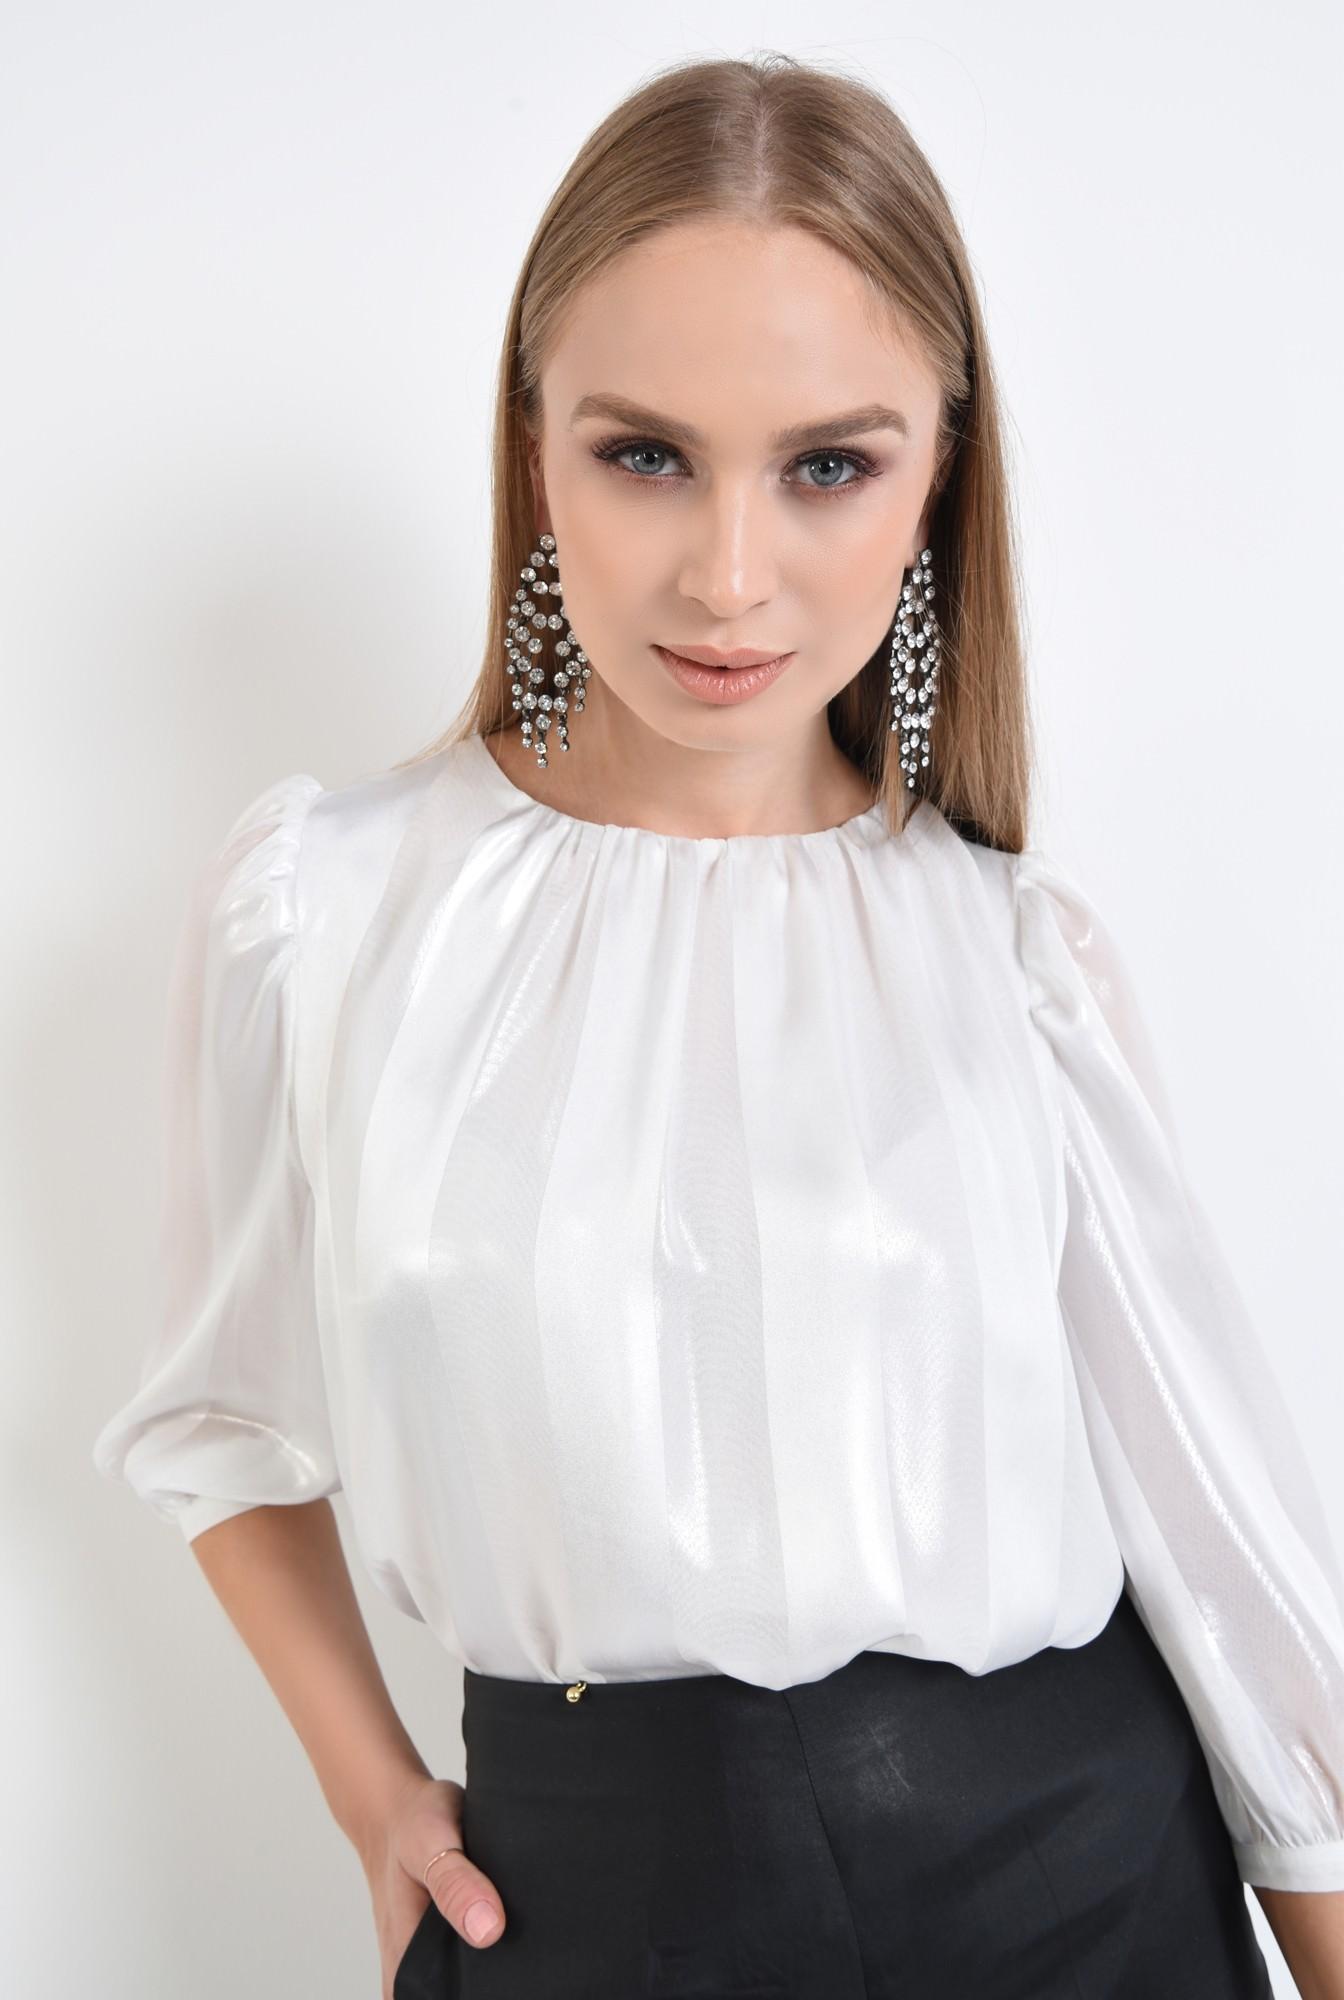 2 - 360 - bluza eleganta argintie, sifon, dungi, pliseuri la decolteu